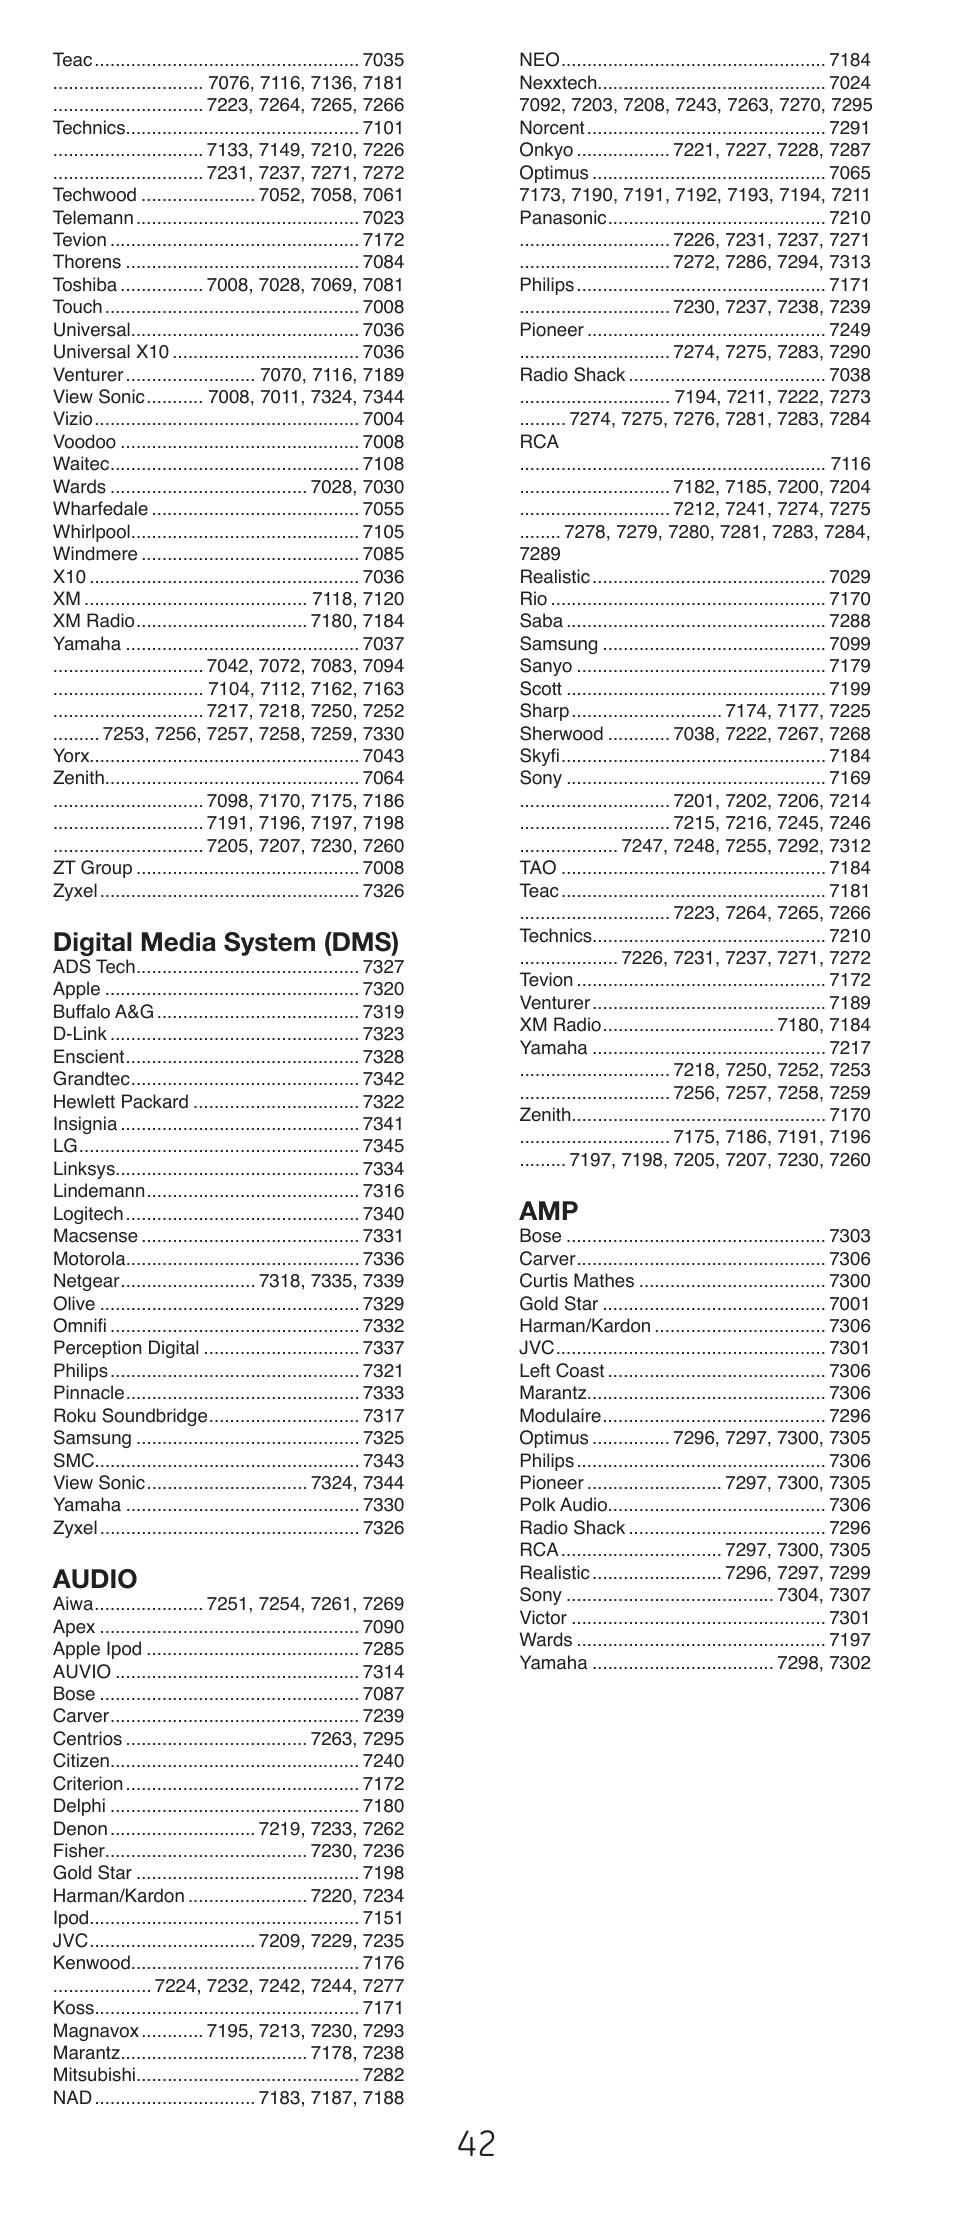 Digital media system (dms), Audio | GE 24911-v2 GE Universal Remote